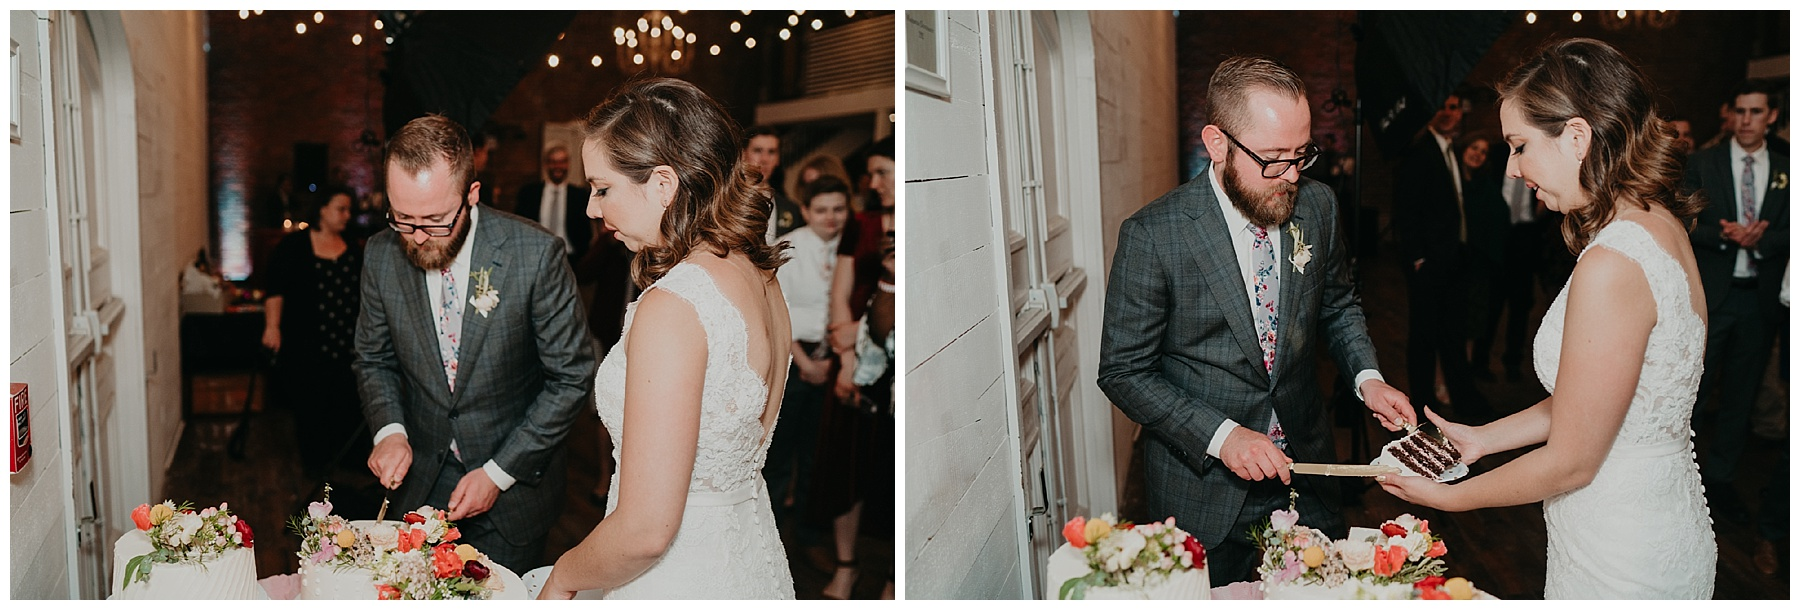 the_ravington_wedding_arkansas_0072.jpg